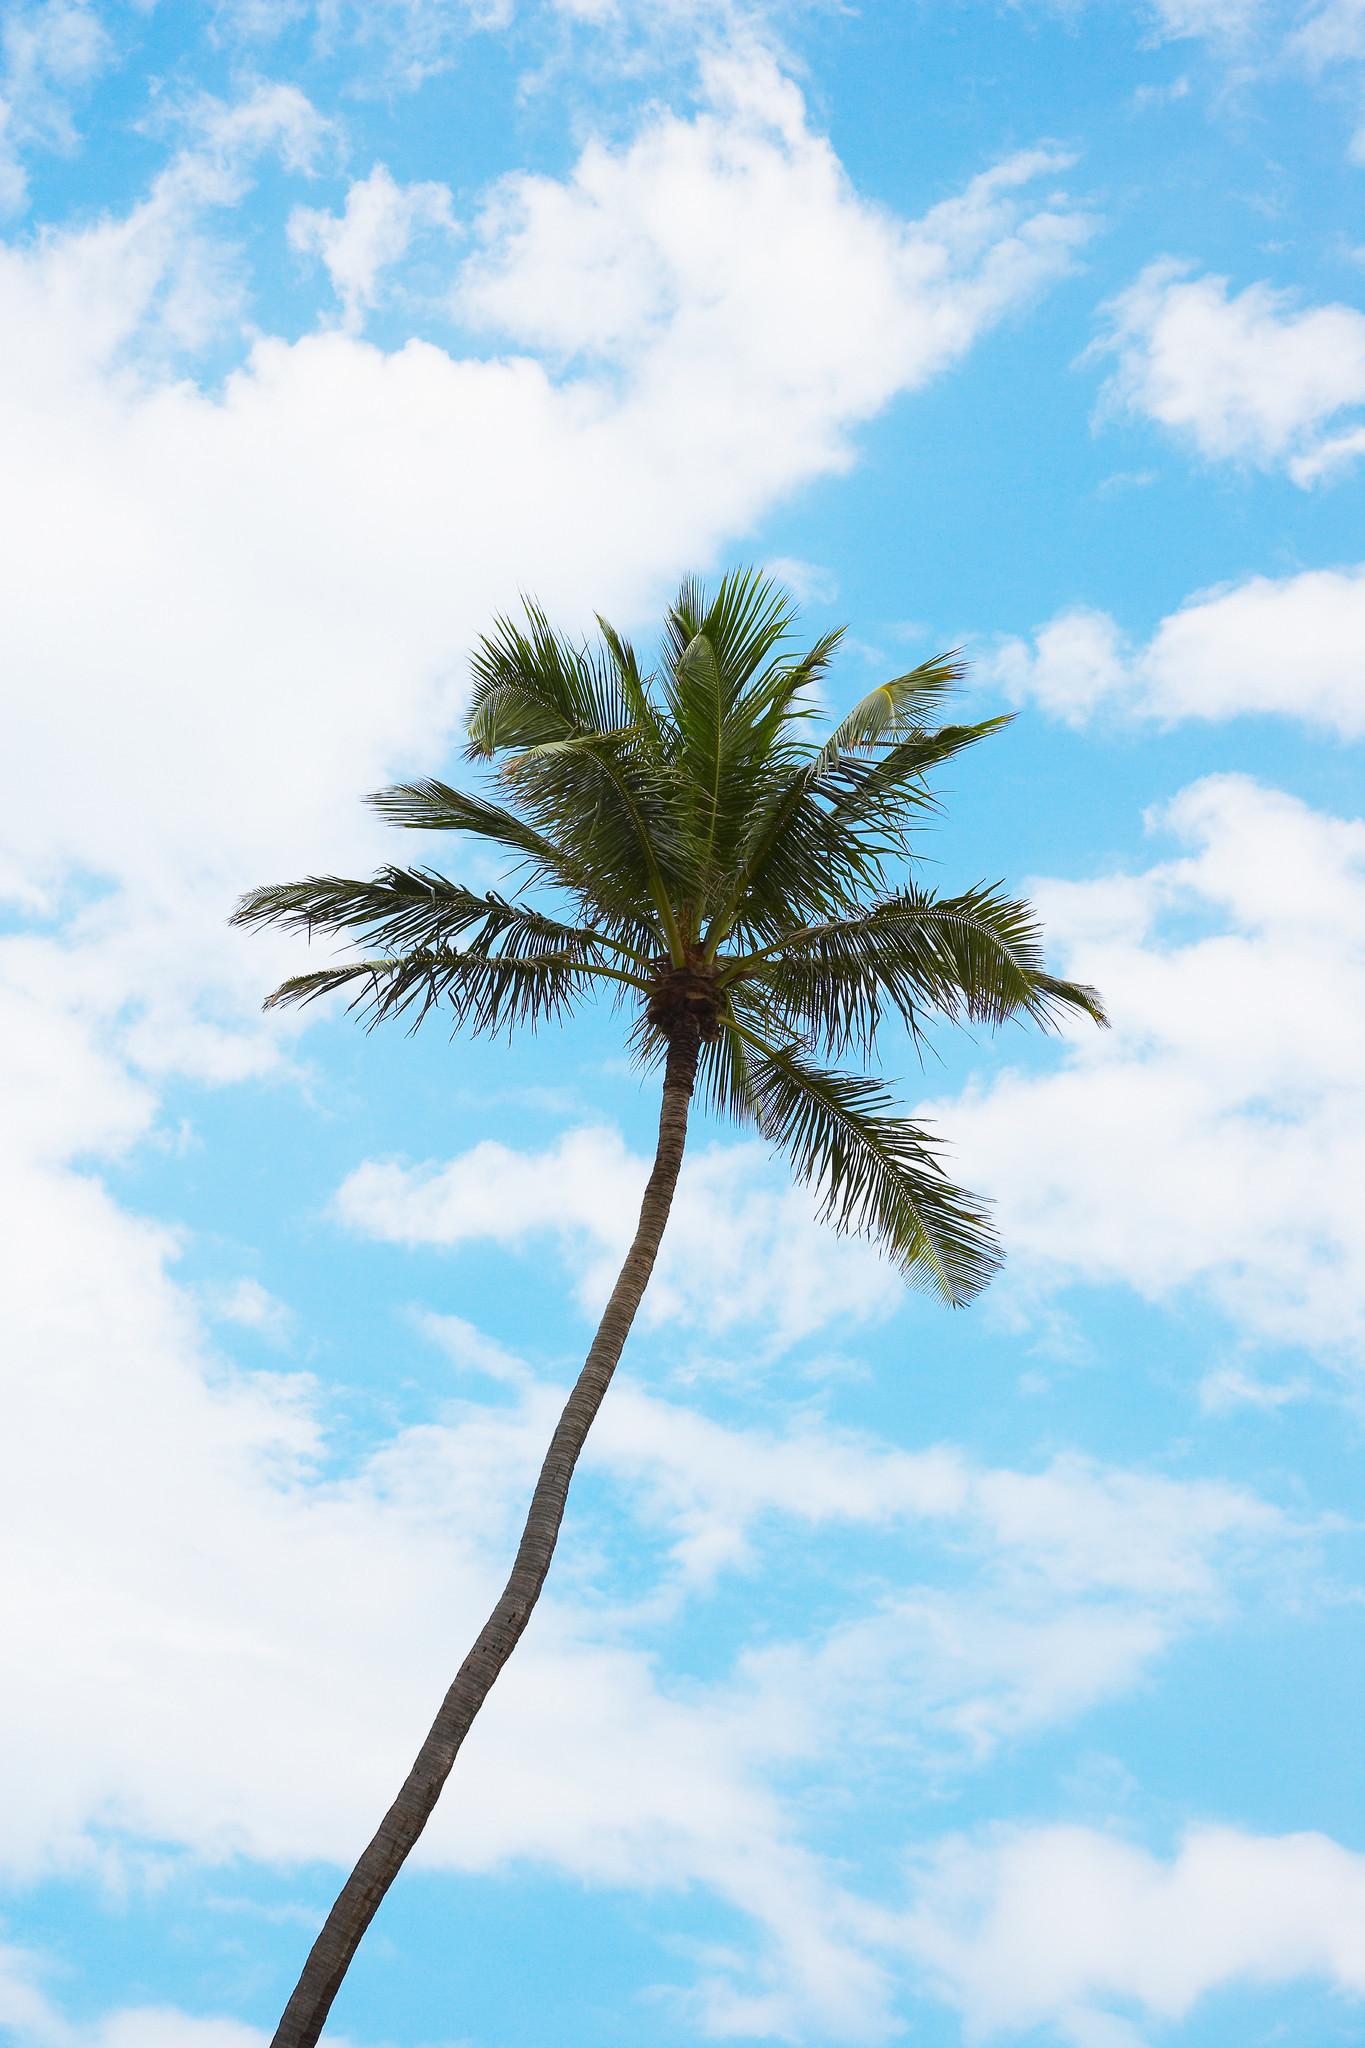 Craigslist Fort Lauderdale Jobs Fabulous Radpad Blamed The